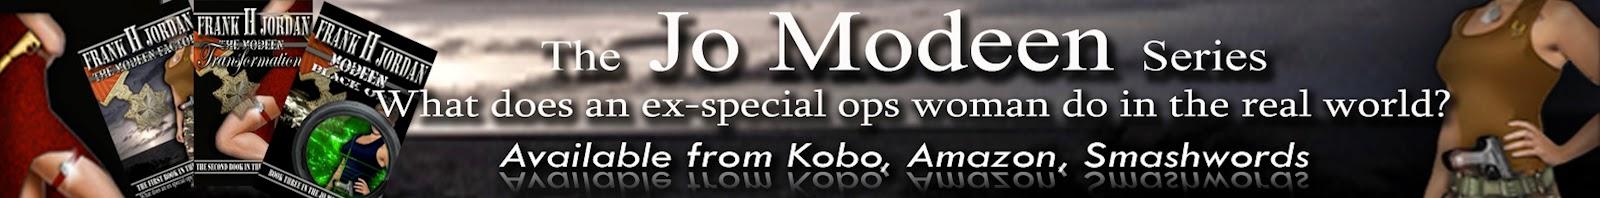 http://store.kobobooks.com/search?Query=Modeen+black+ops